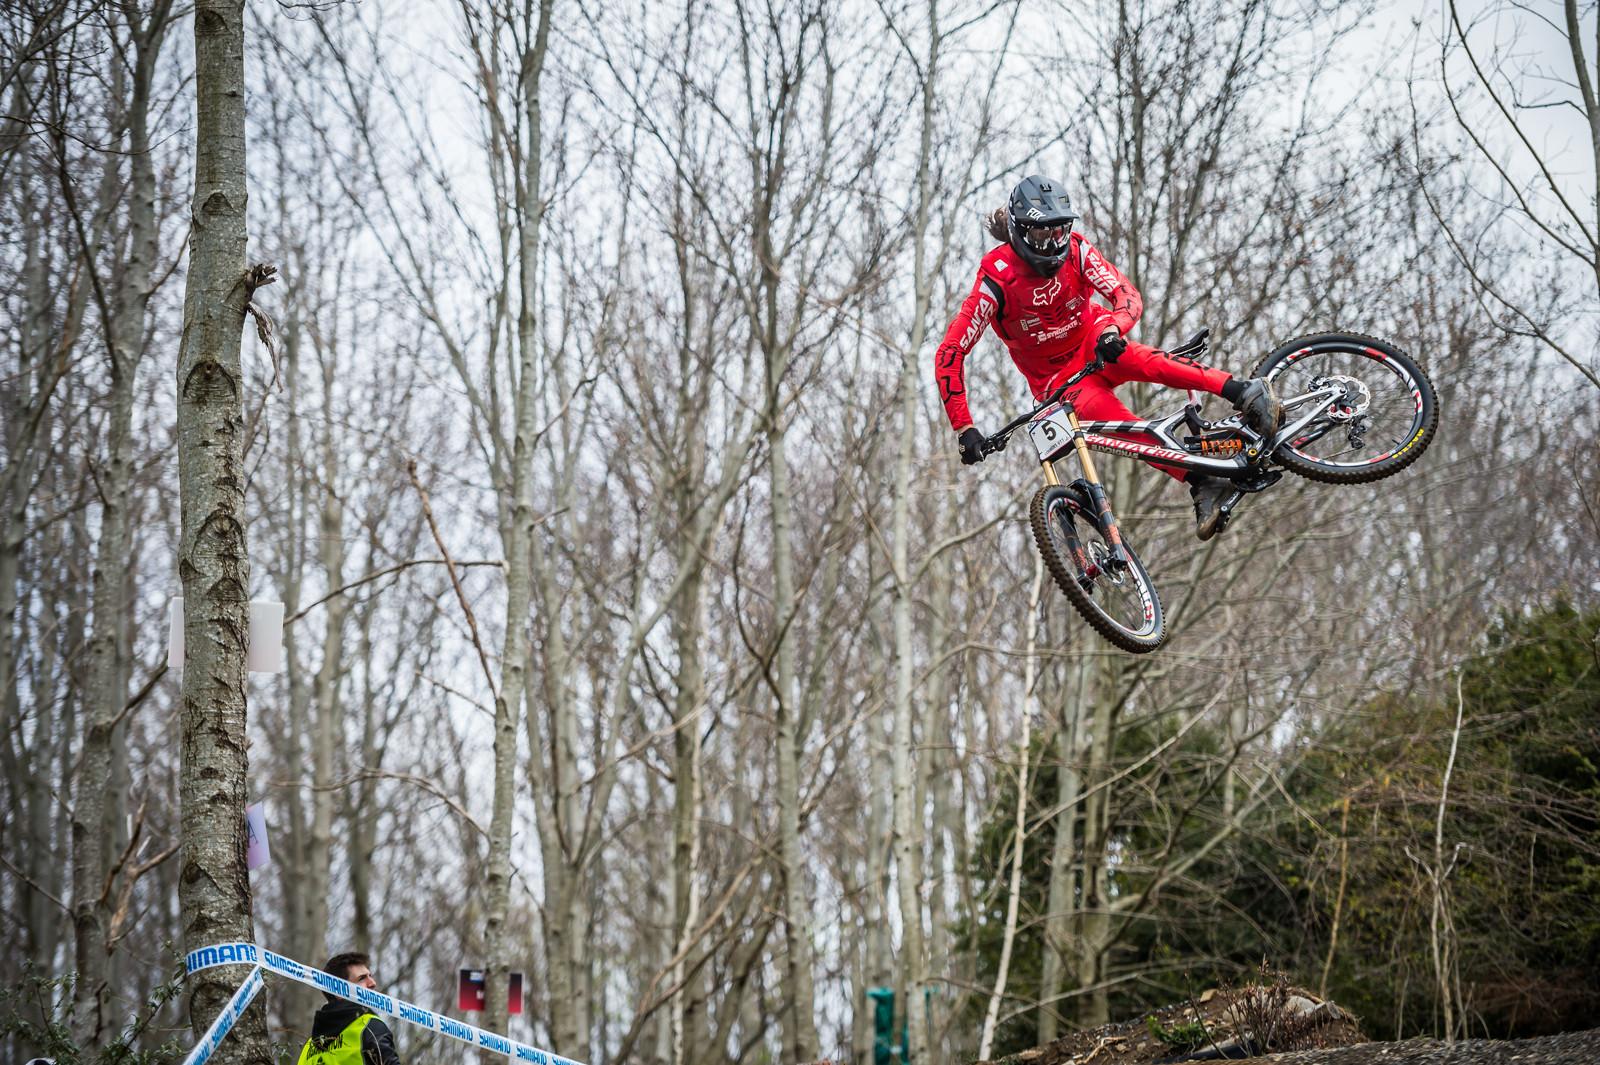 Ratboy Blasting - iceman2058 - Mountain Biking Pictures - Vital MTB